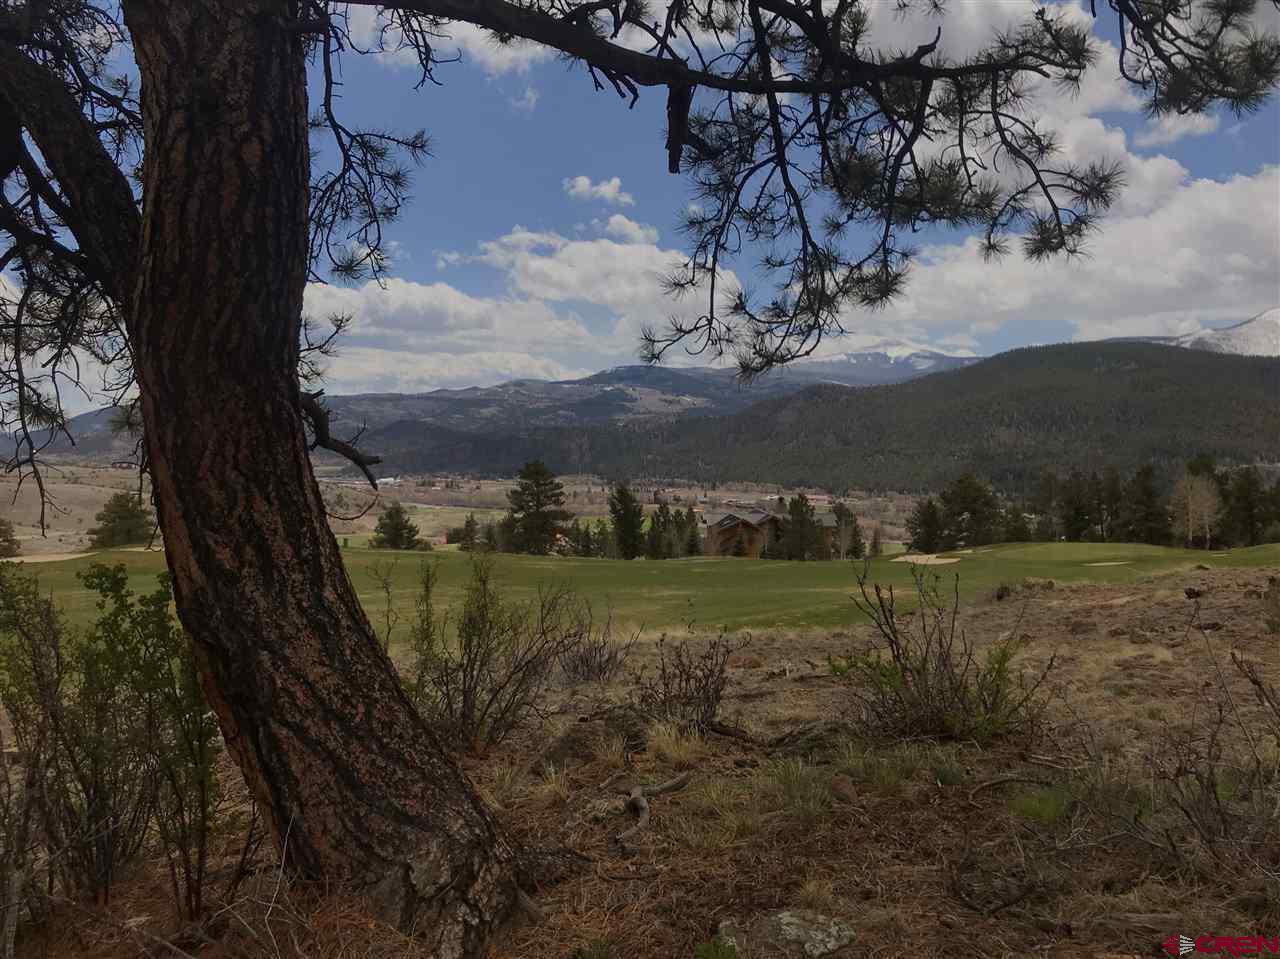 710 Blanca Vista Dr. - Photo 1